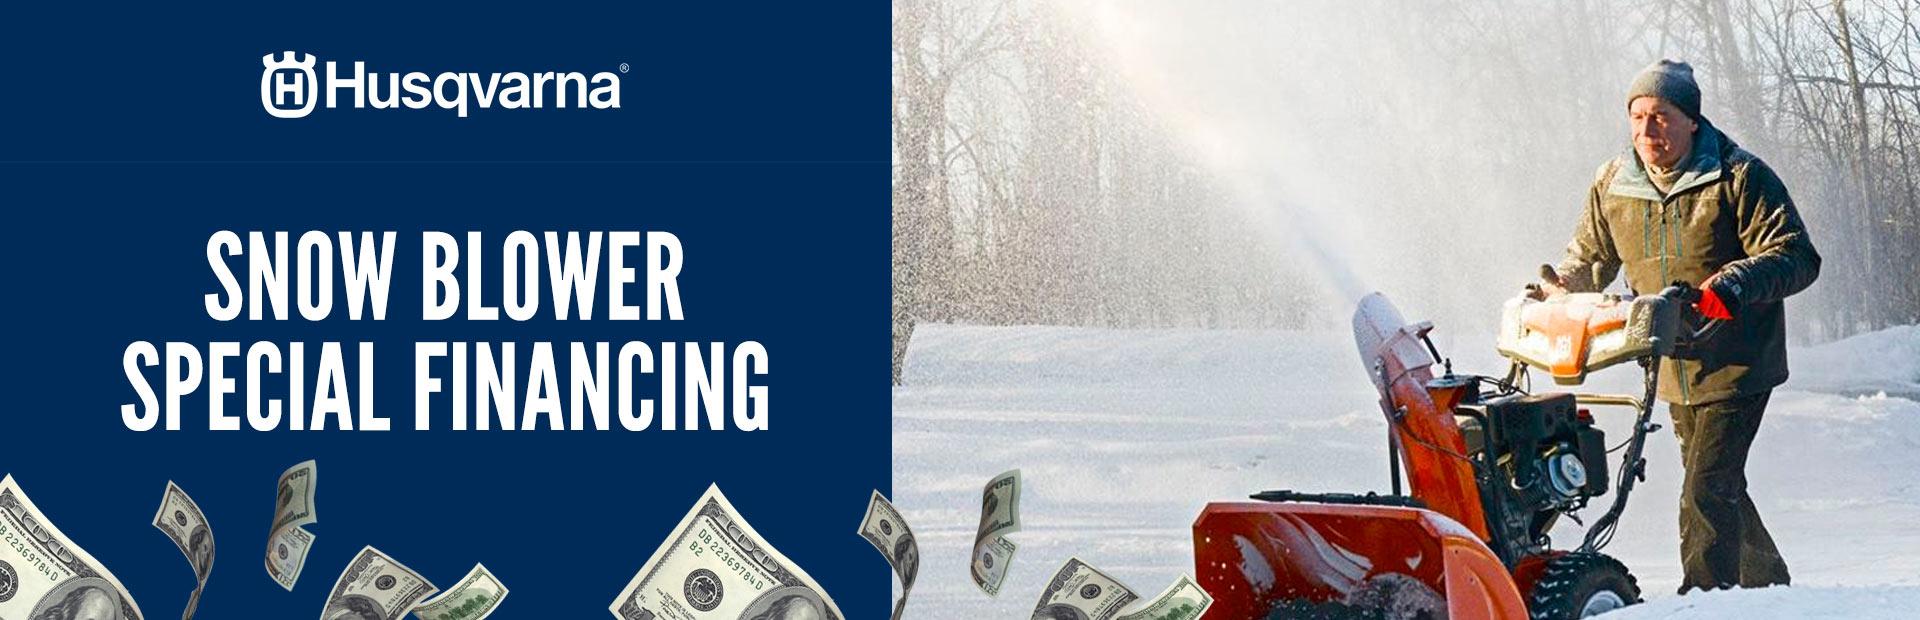 Husqvarna Snow Blower Special Financing Jones Power Sports Ltd